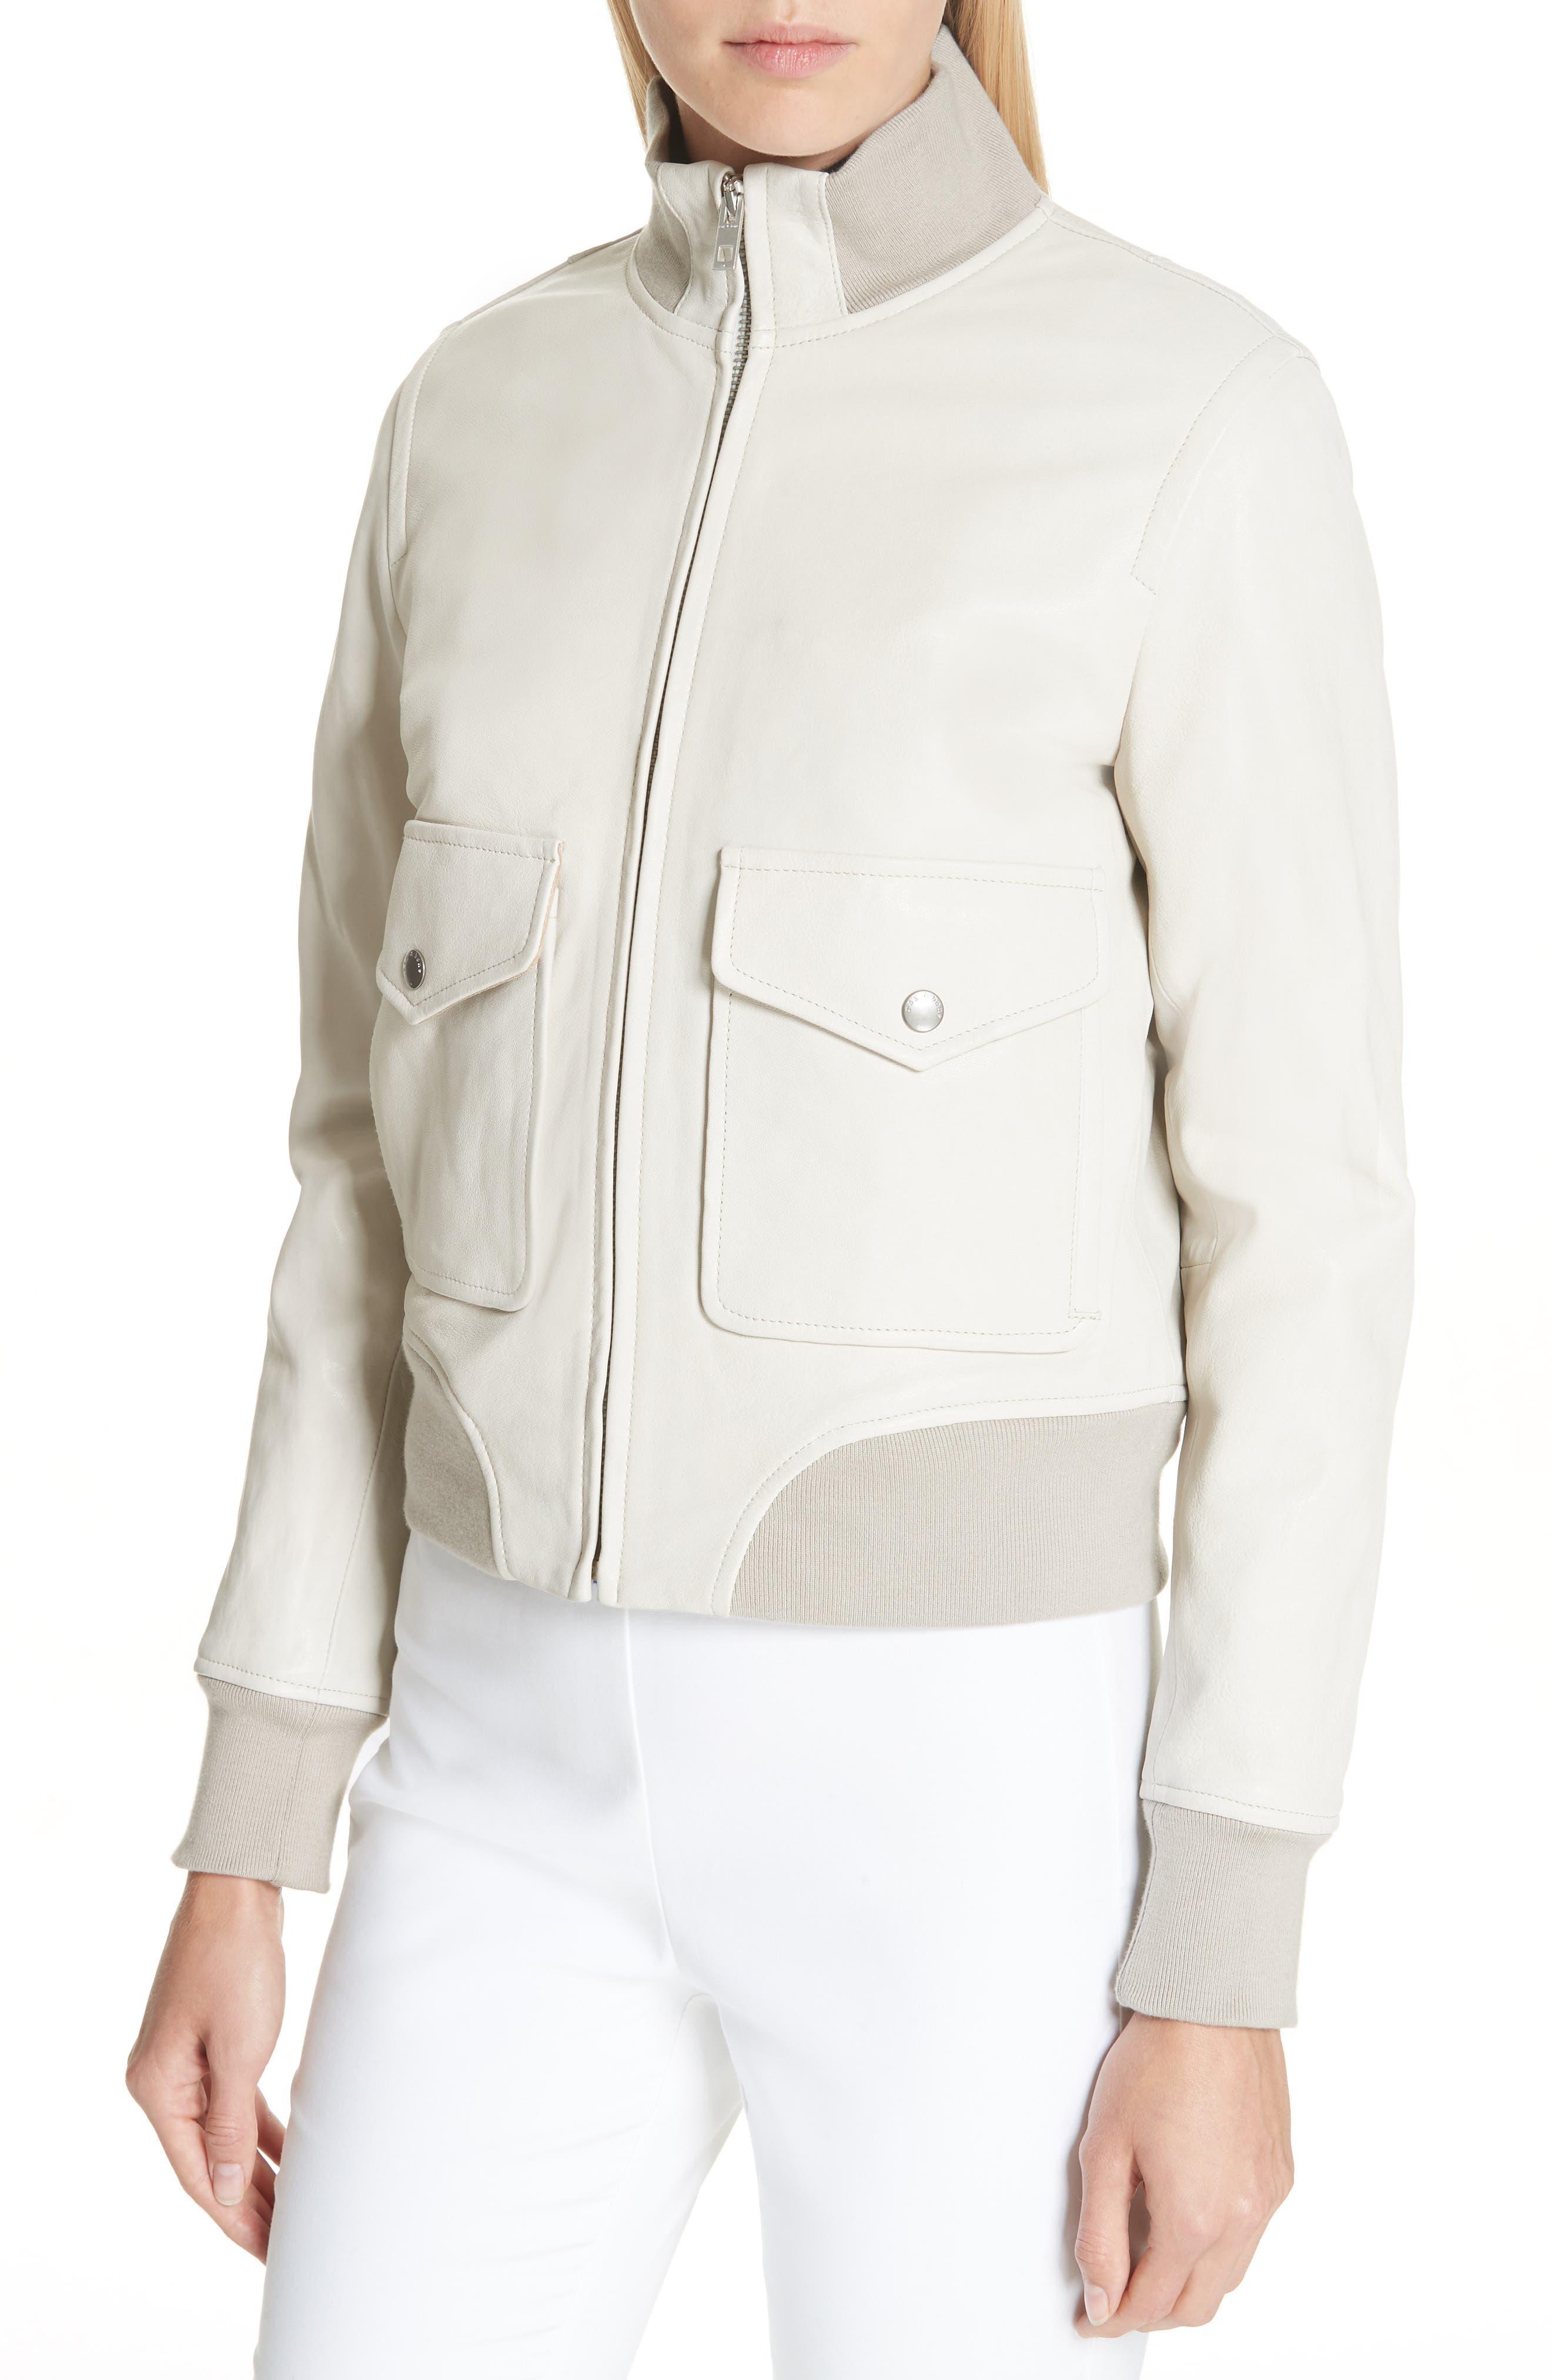 Mila Lambskin Leather Jacket,                             Alternate thumbnail 4, color,                             IVORY